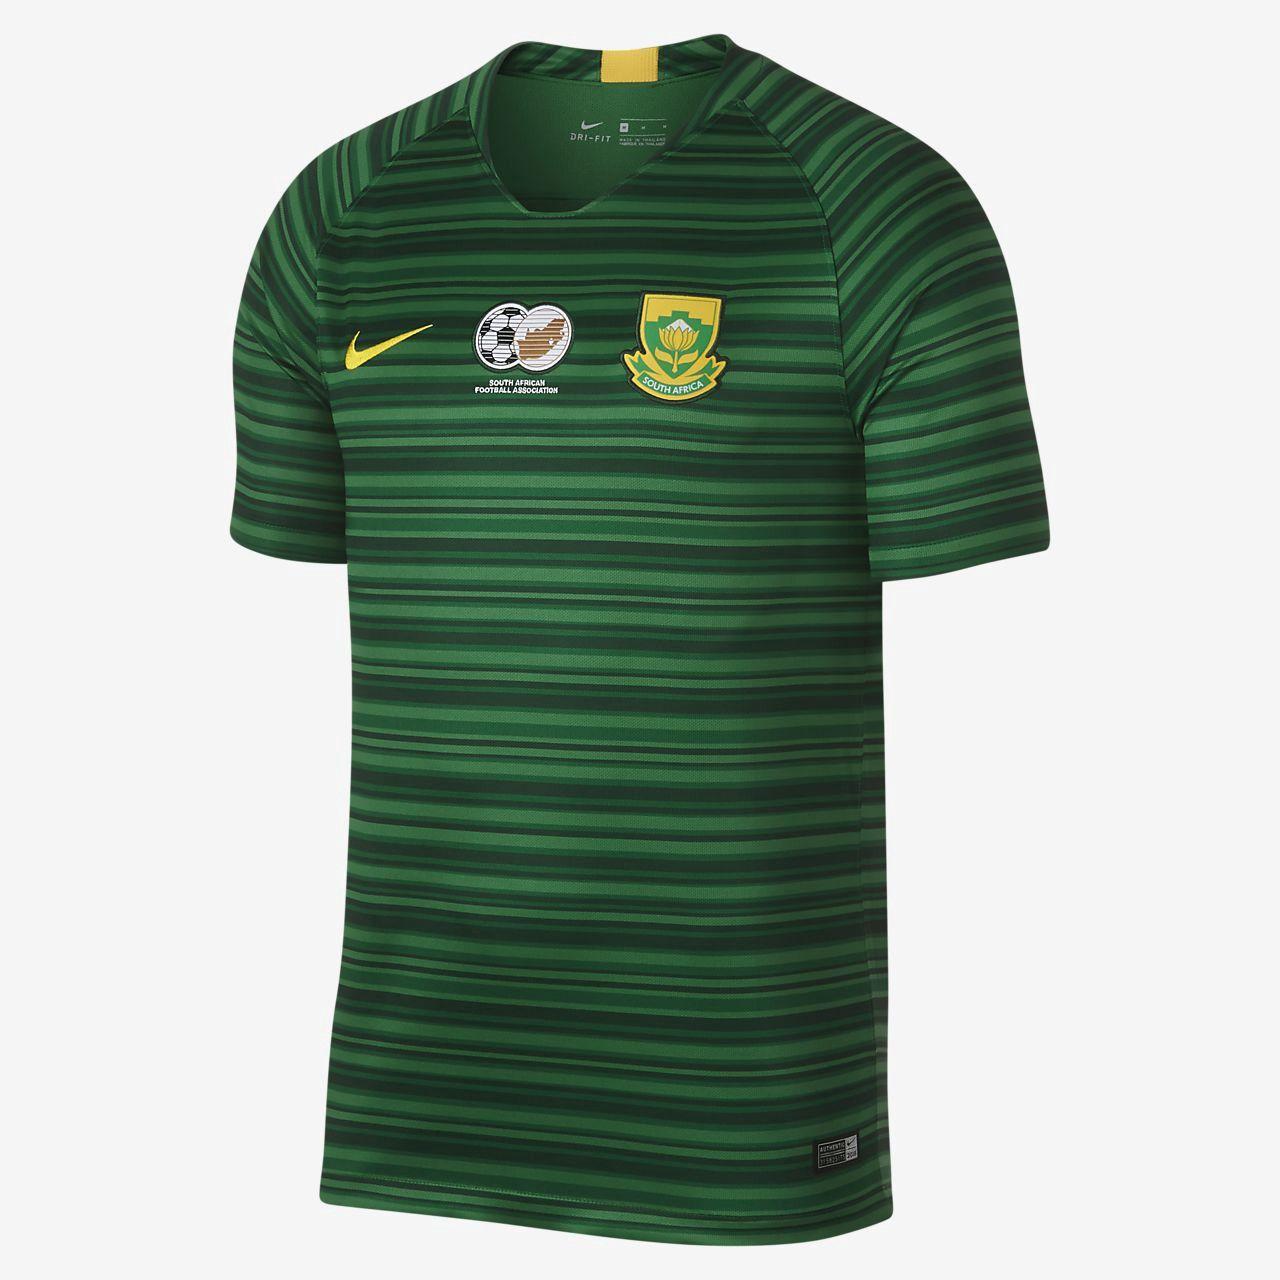 Nike 2018 South Africa Stadium Away Men s Soccer Jersey - L ... 417450e5f